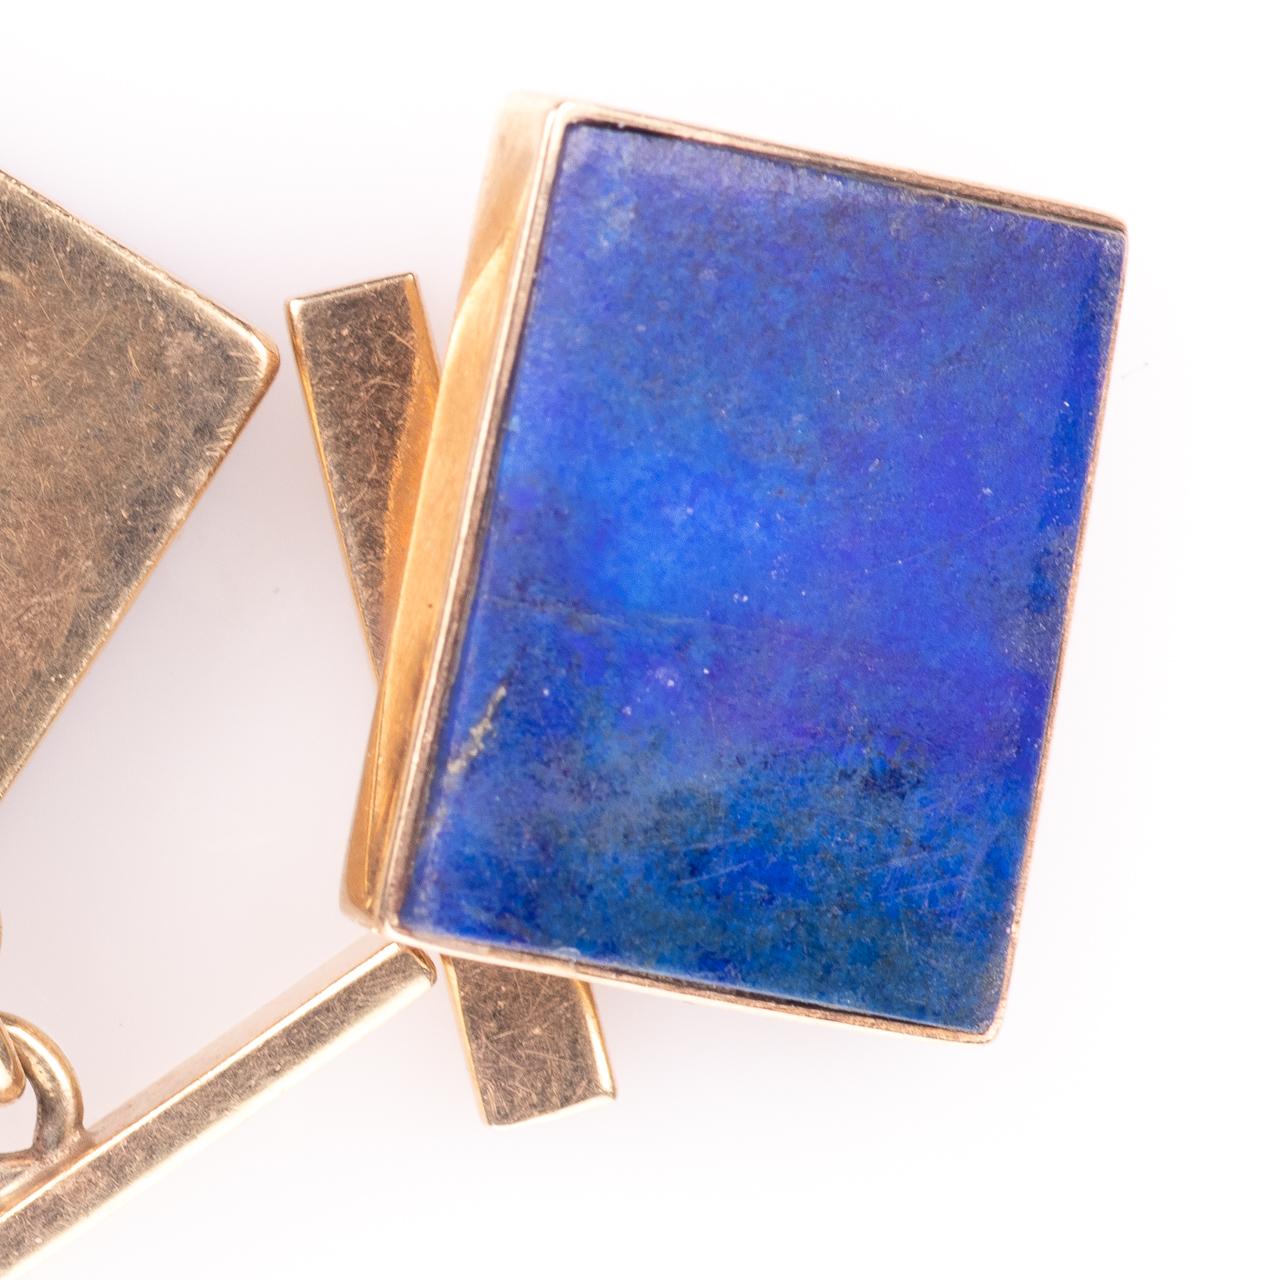 9ct Gold Gentleman's Lapis Lazuli Cufflinks - Image 2 of 5